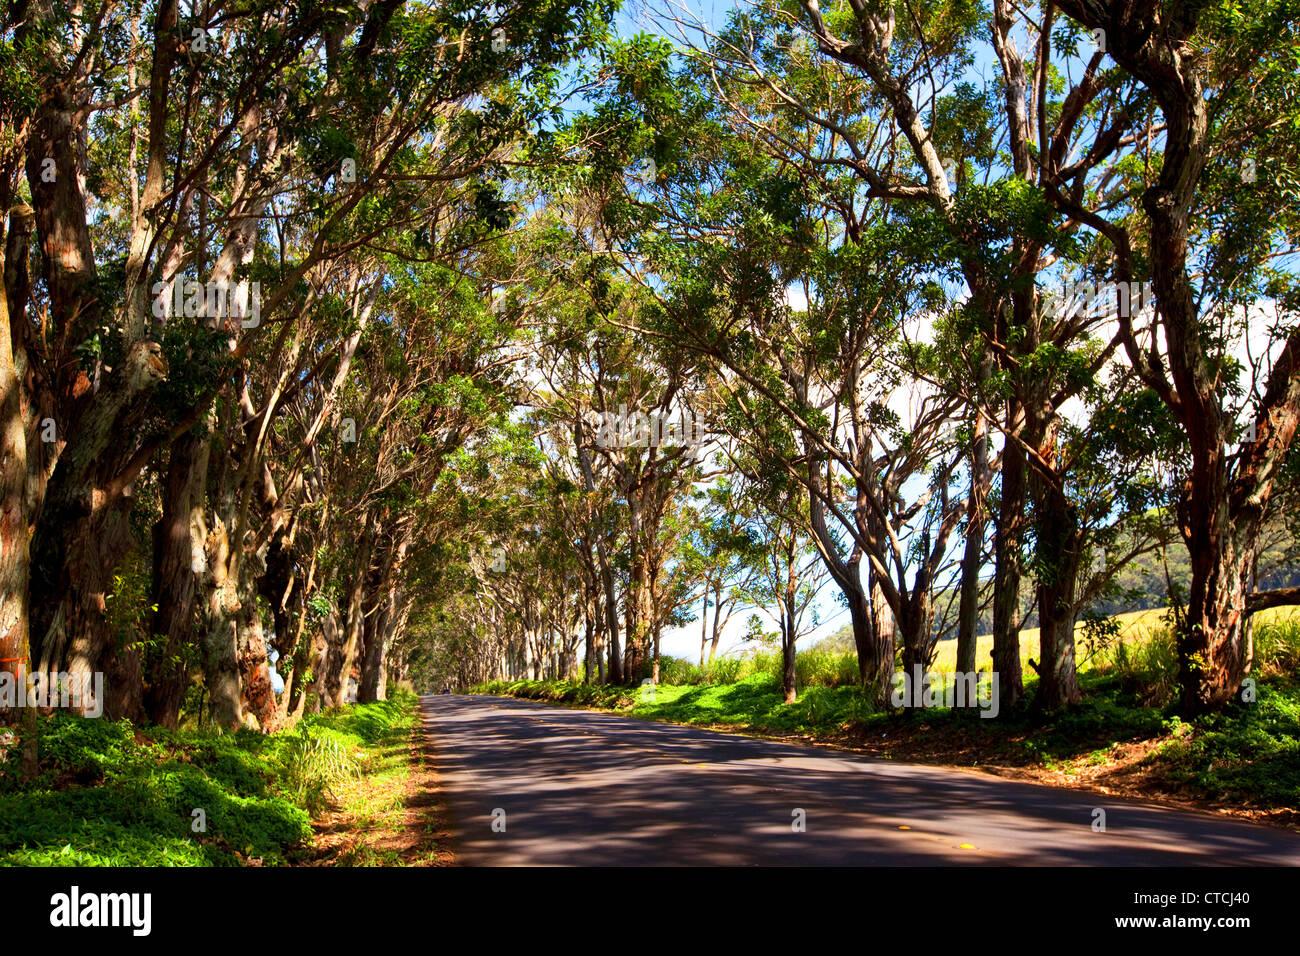 Swamp Acajou, Tunnel d'arbres, Koloa, Poipu, Kauai, Hawaï Banque D'Images